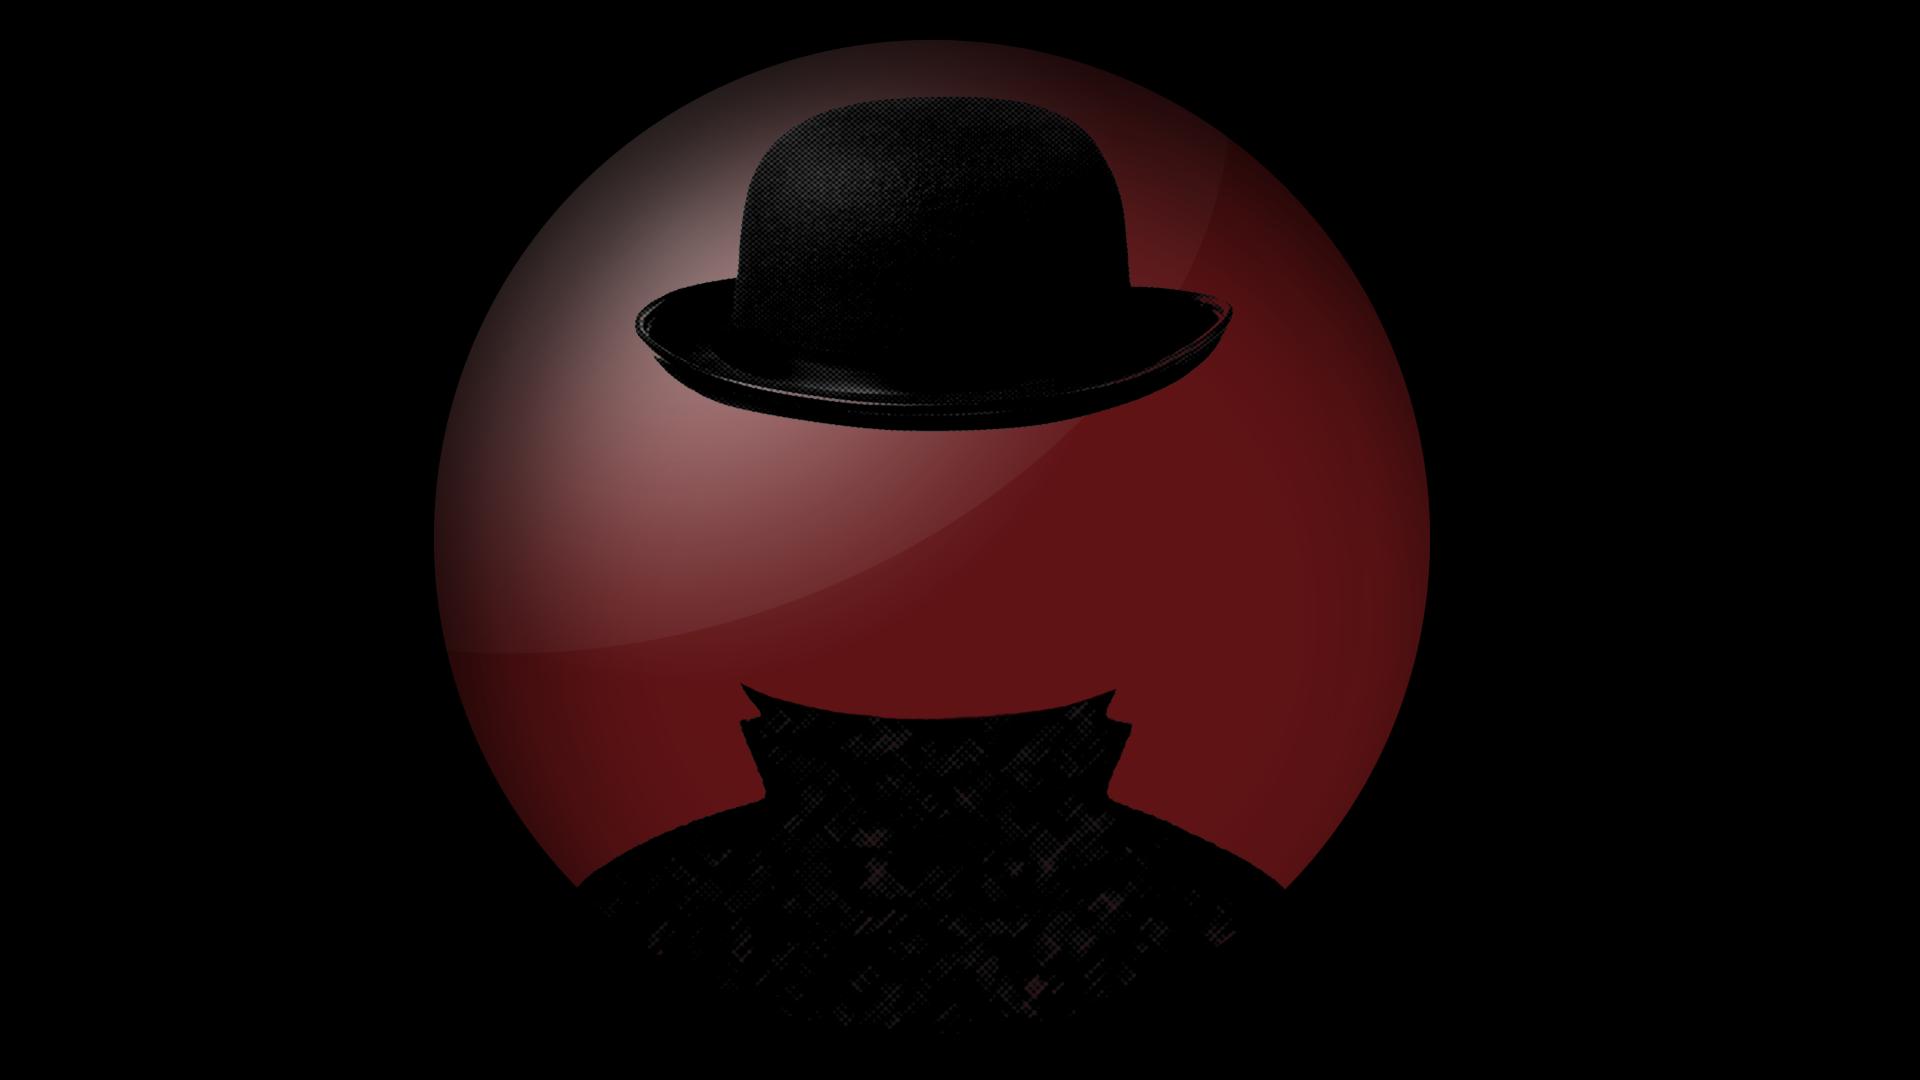 black hat hackers wallpaper - photo #11